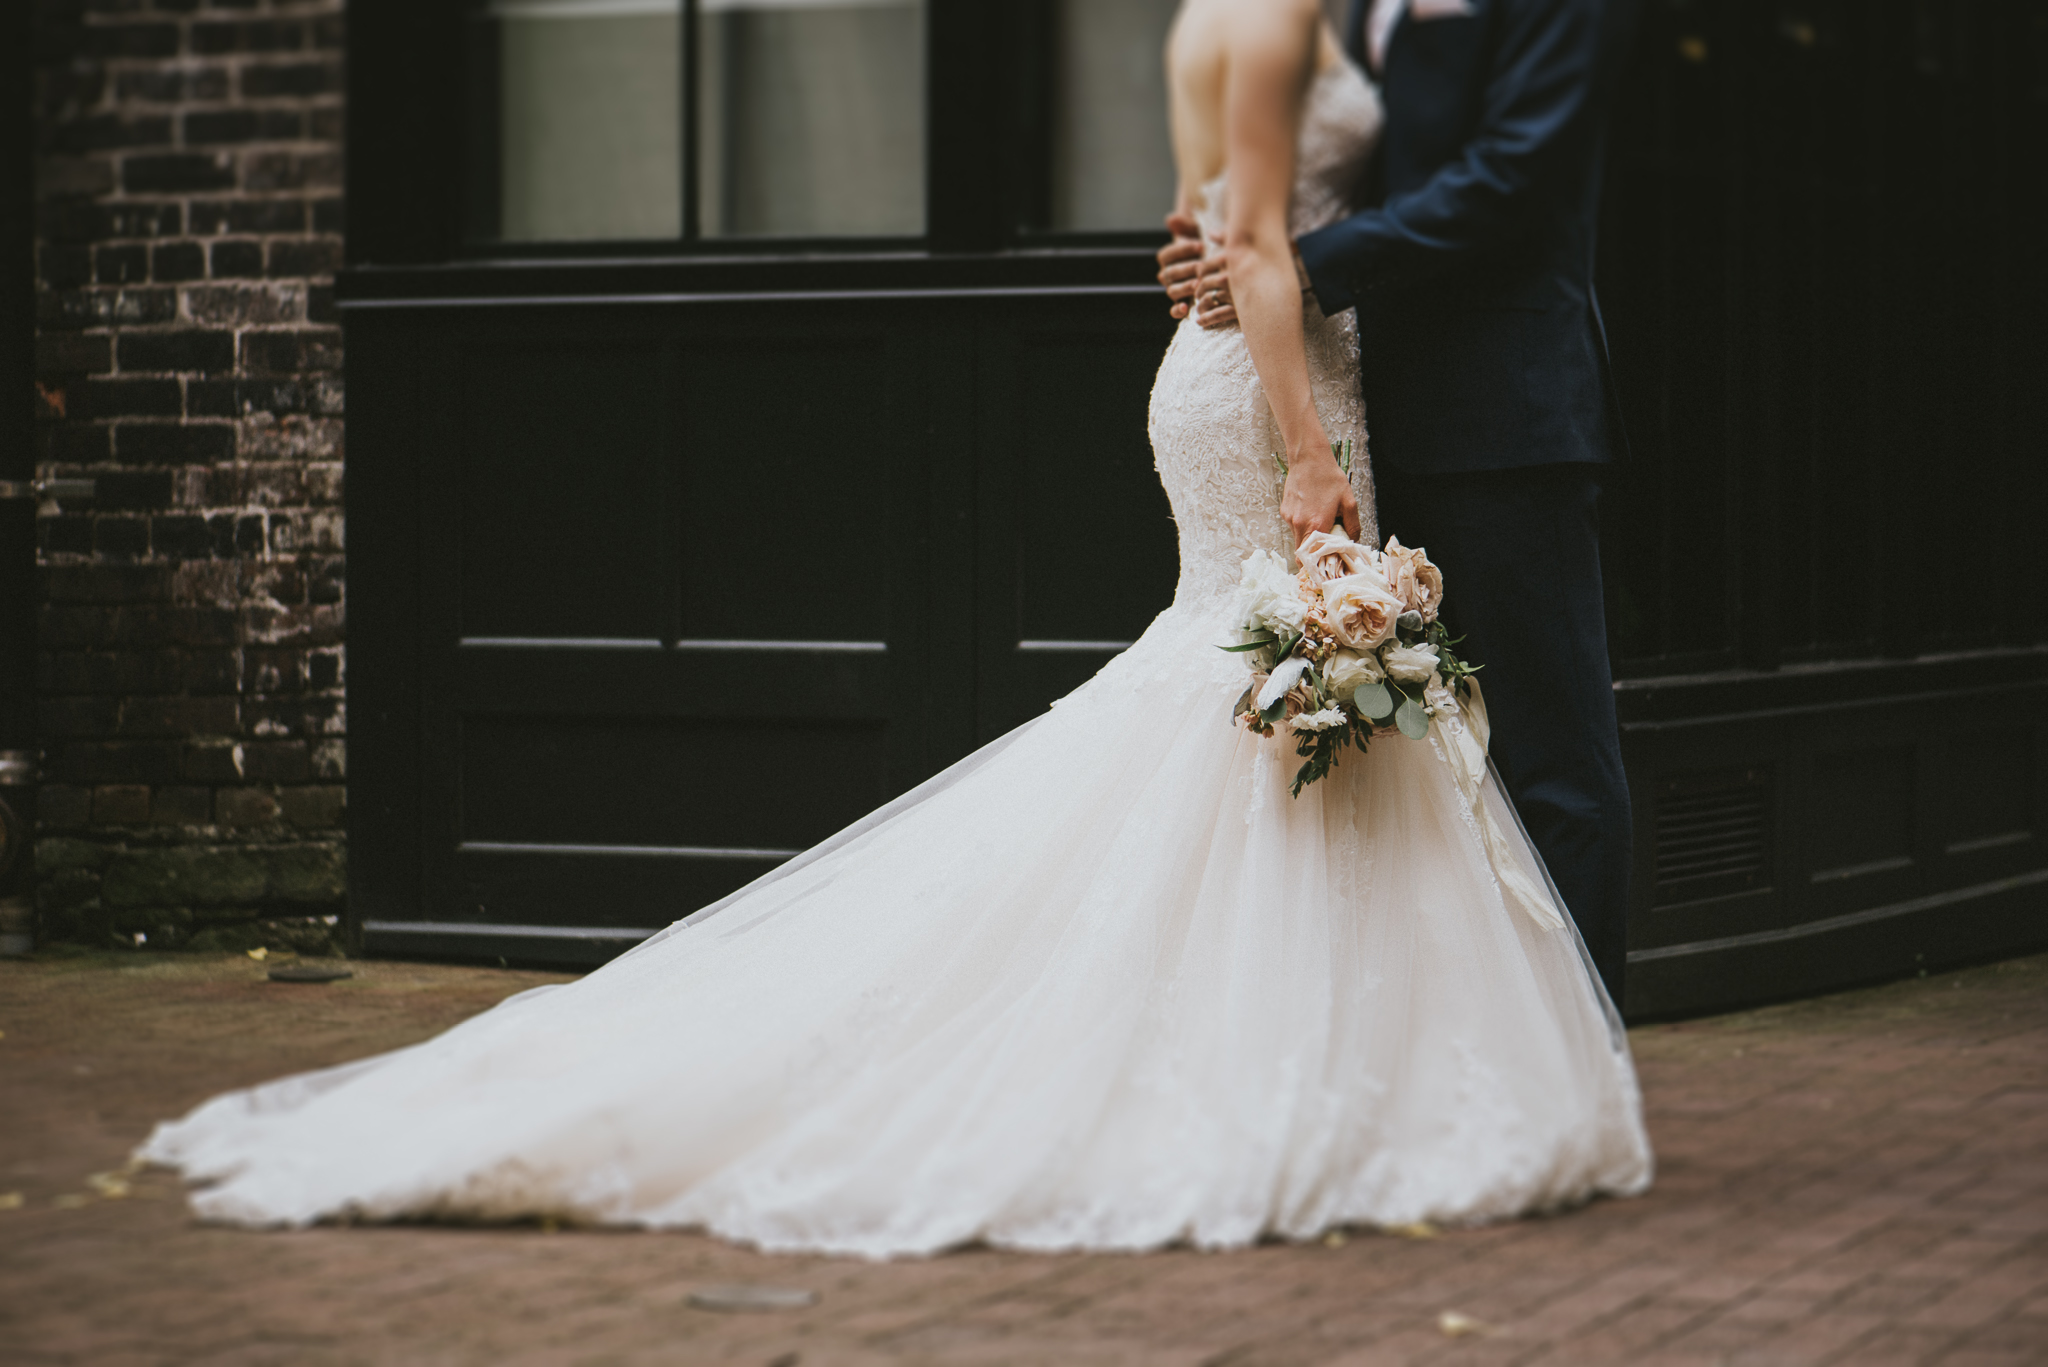 183-permanent-vancouver-wedding-courtneysteven-web-8808-ts.jpg